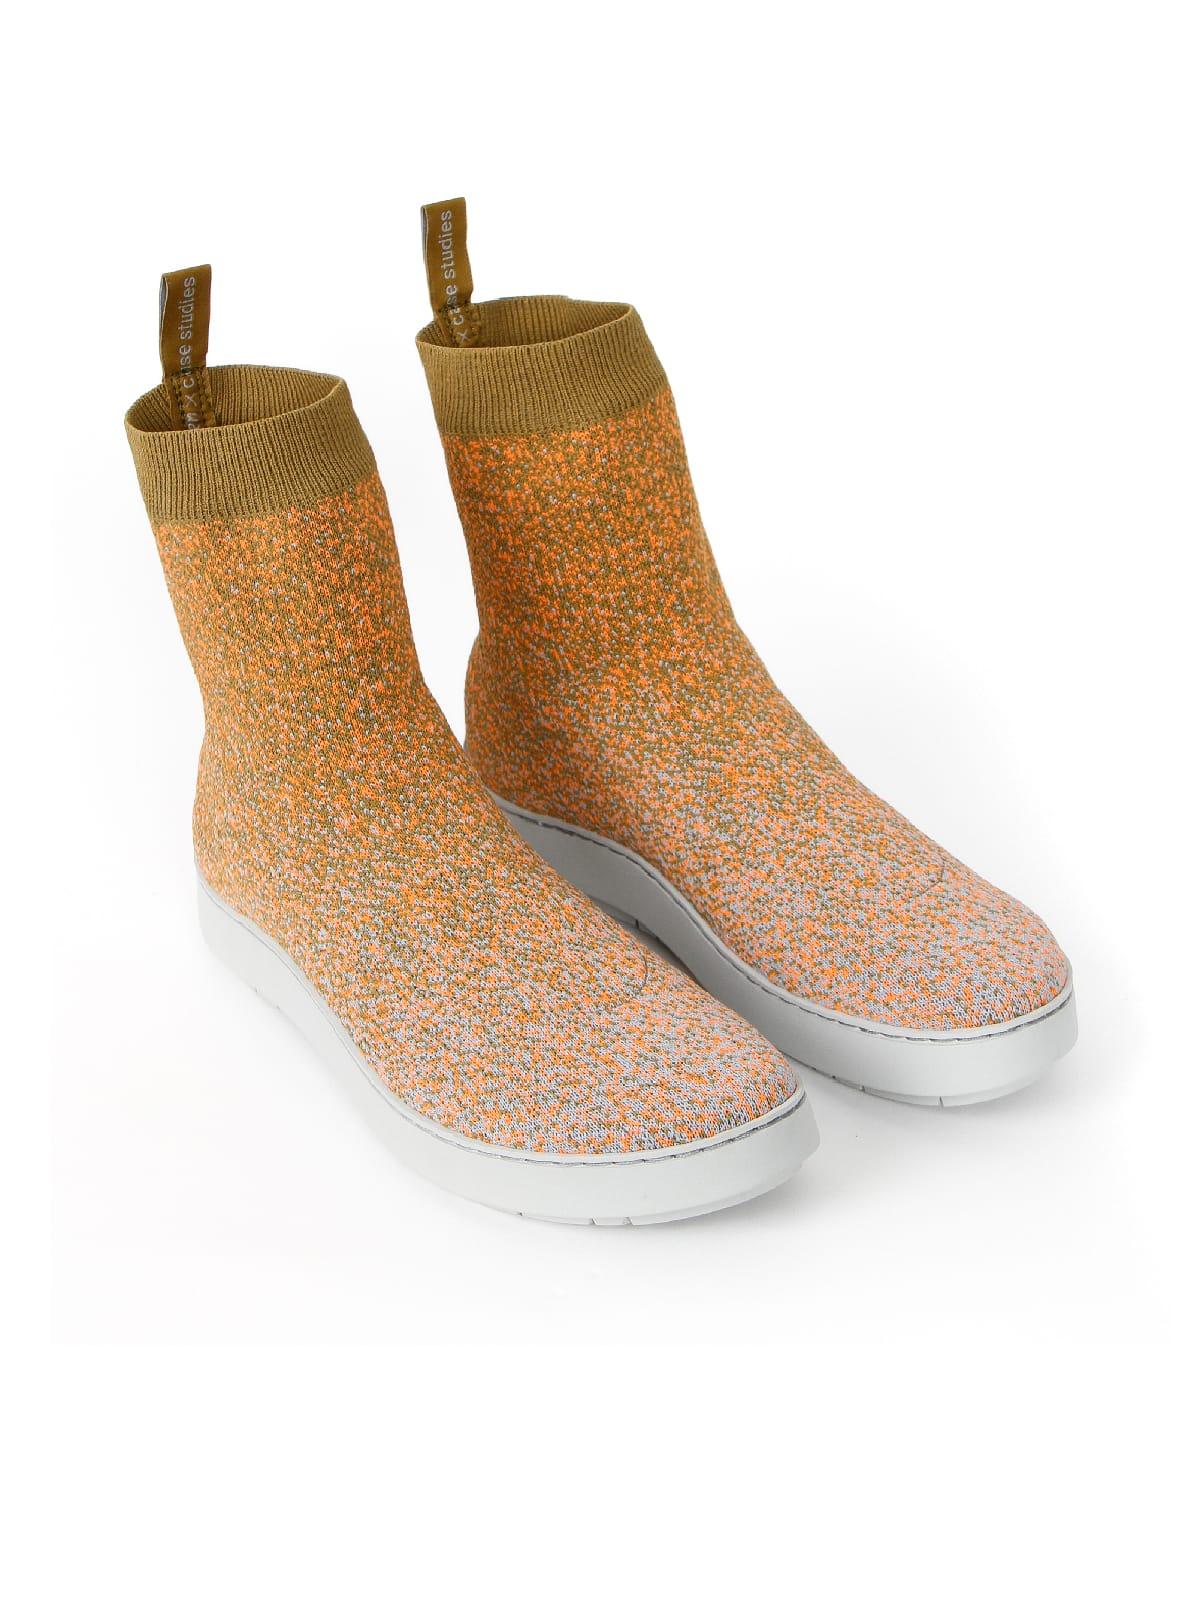 3D knitted sockboot Sparkle papaya schräg